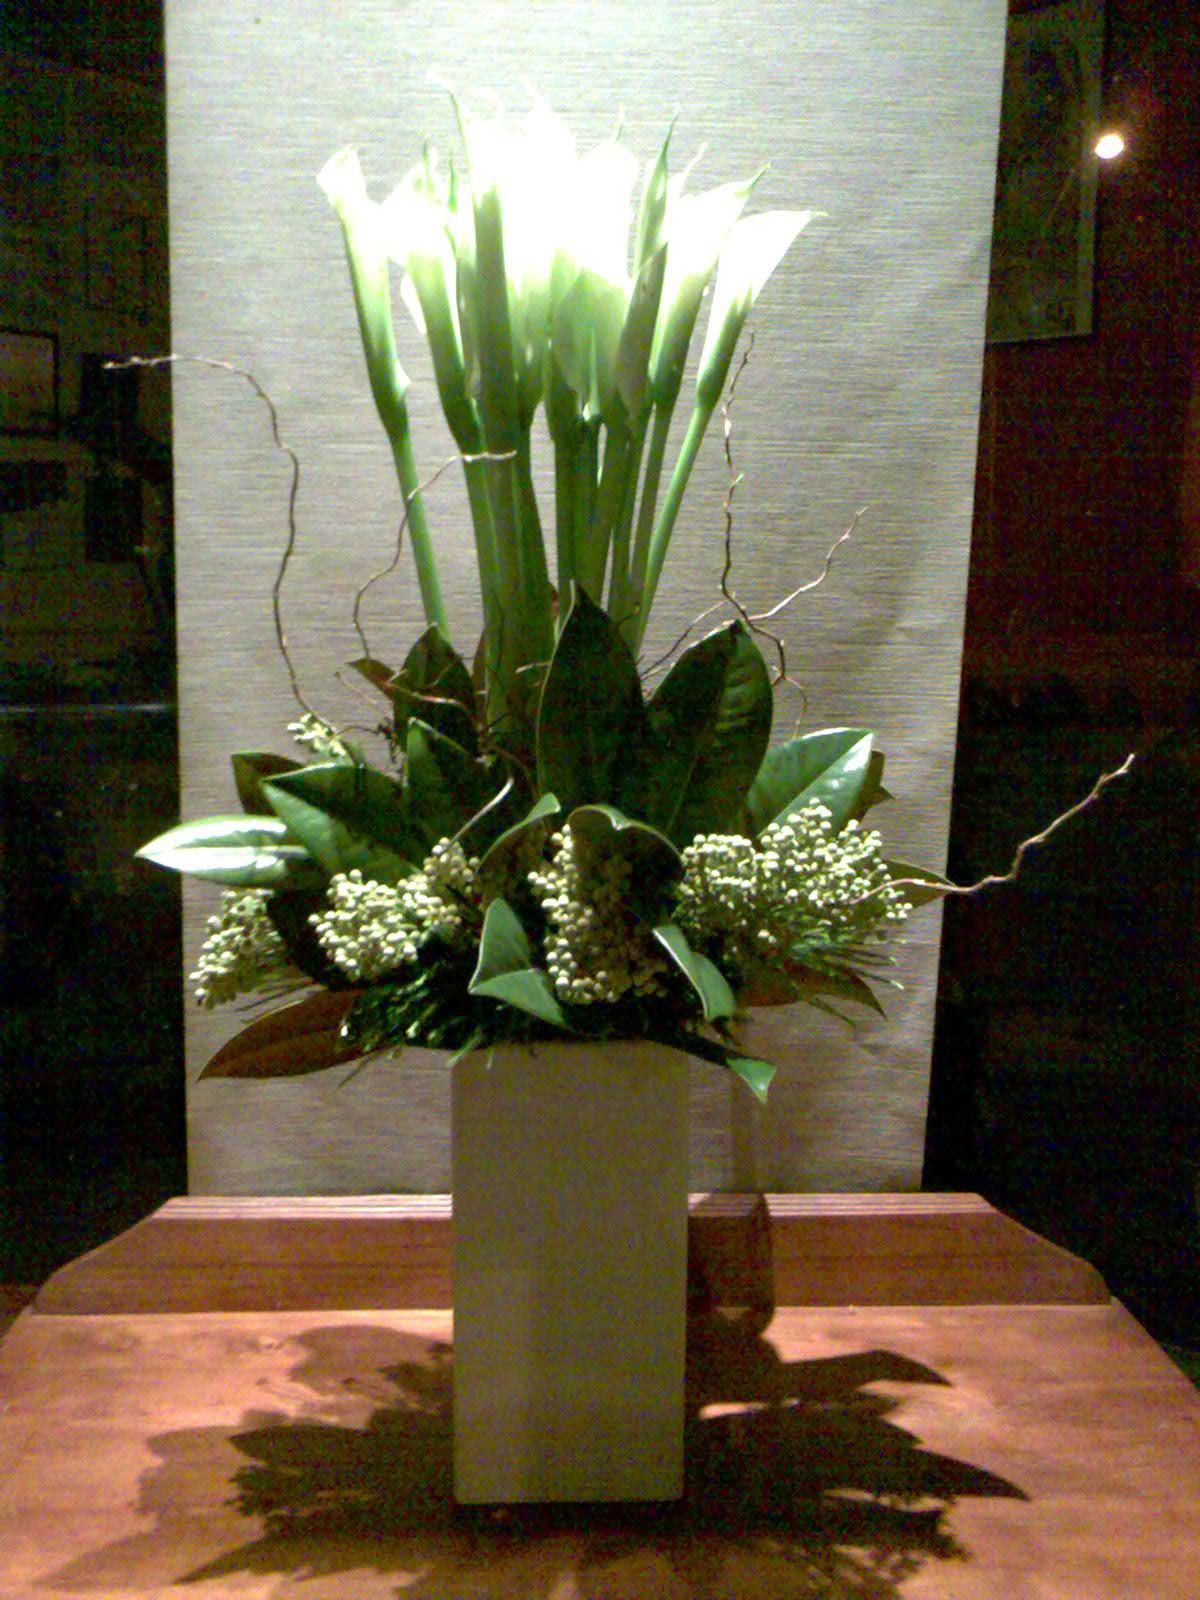 http://www.floweravenue.com.au/images/Arum.jpg